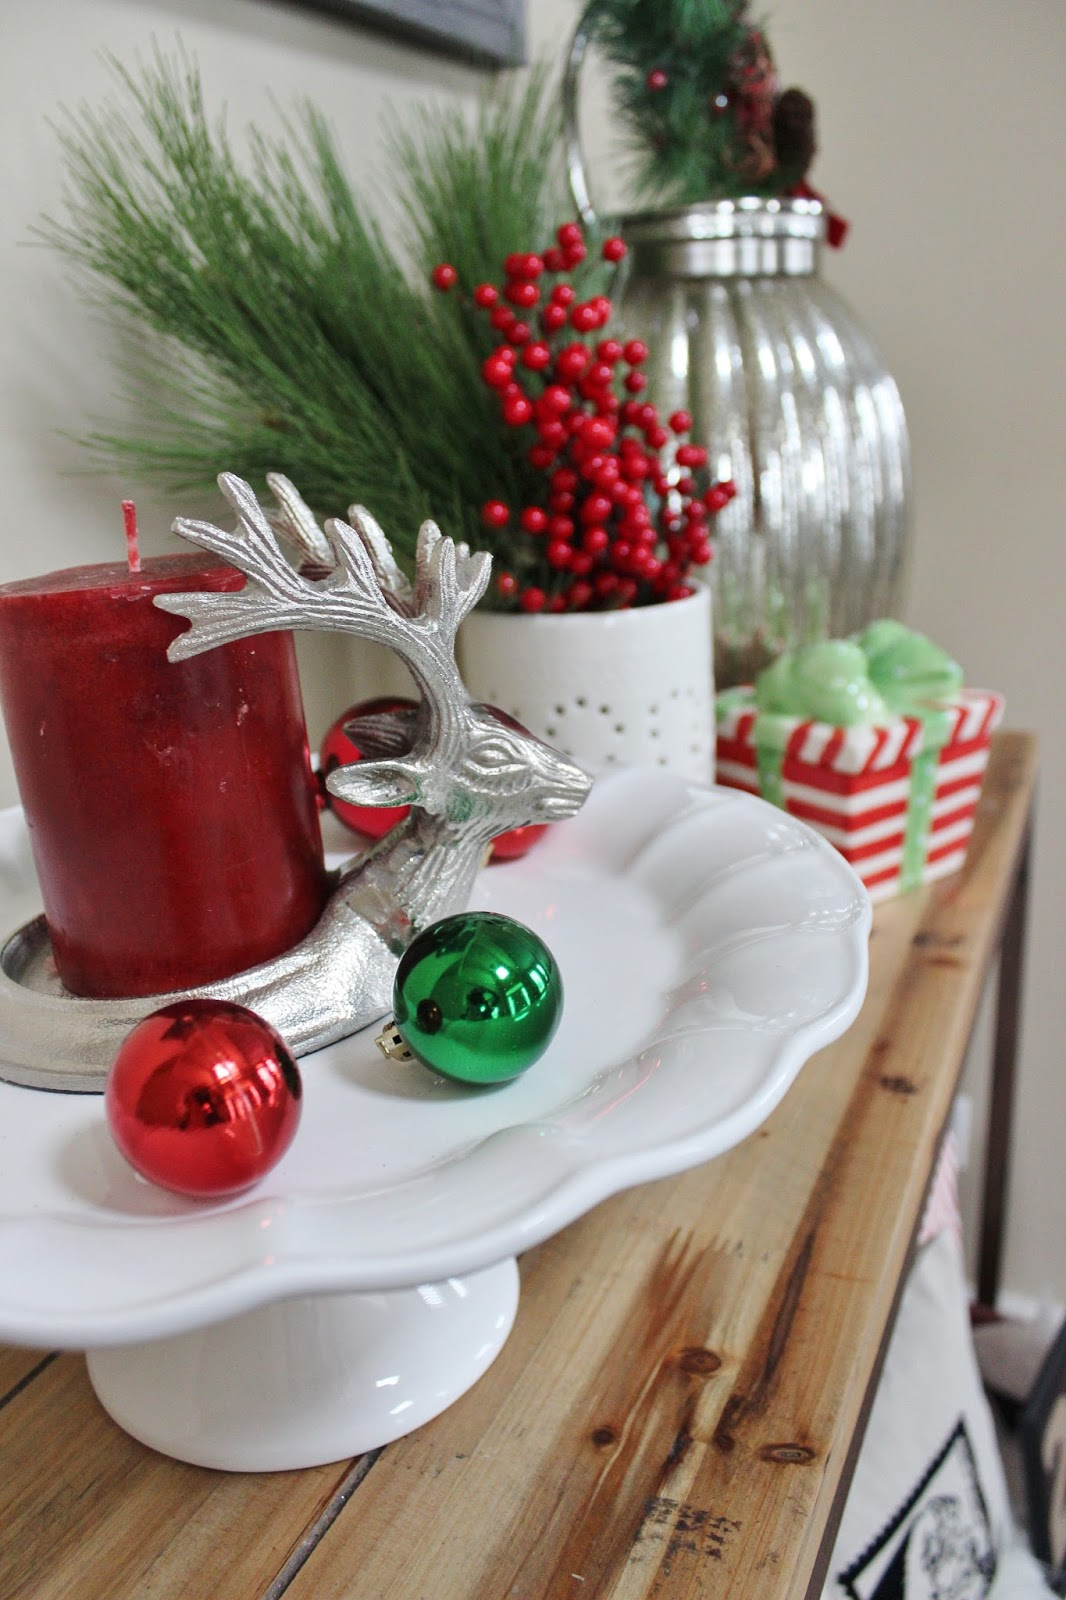 Christmas Entryway Table Decor